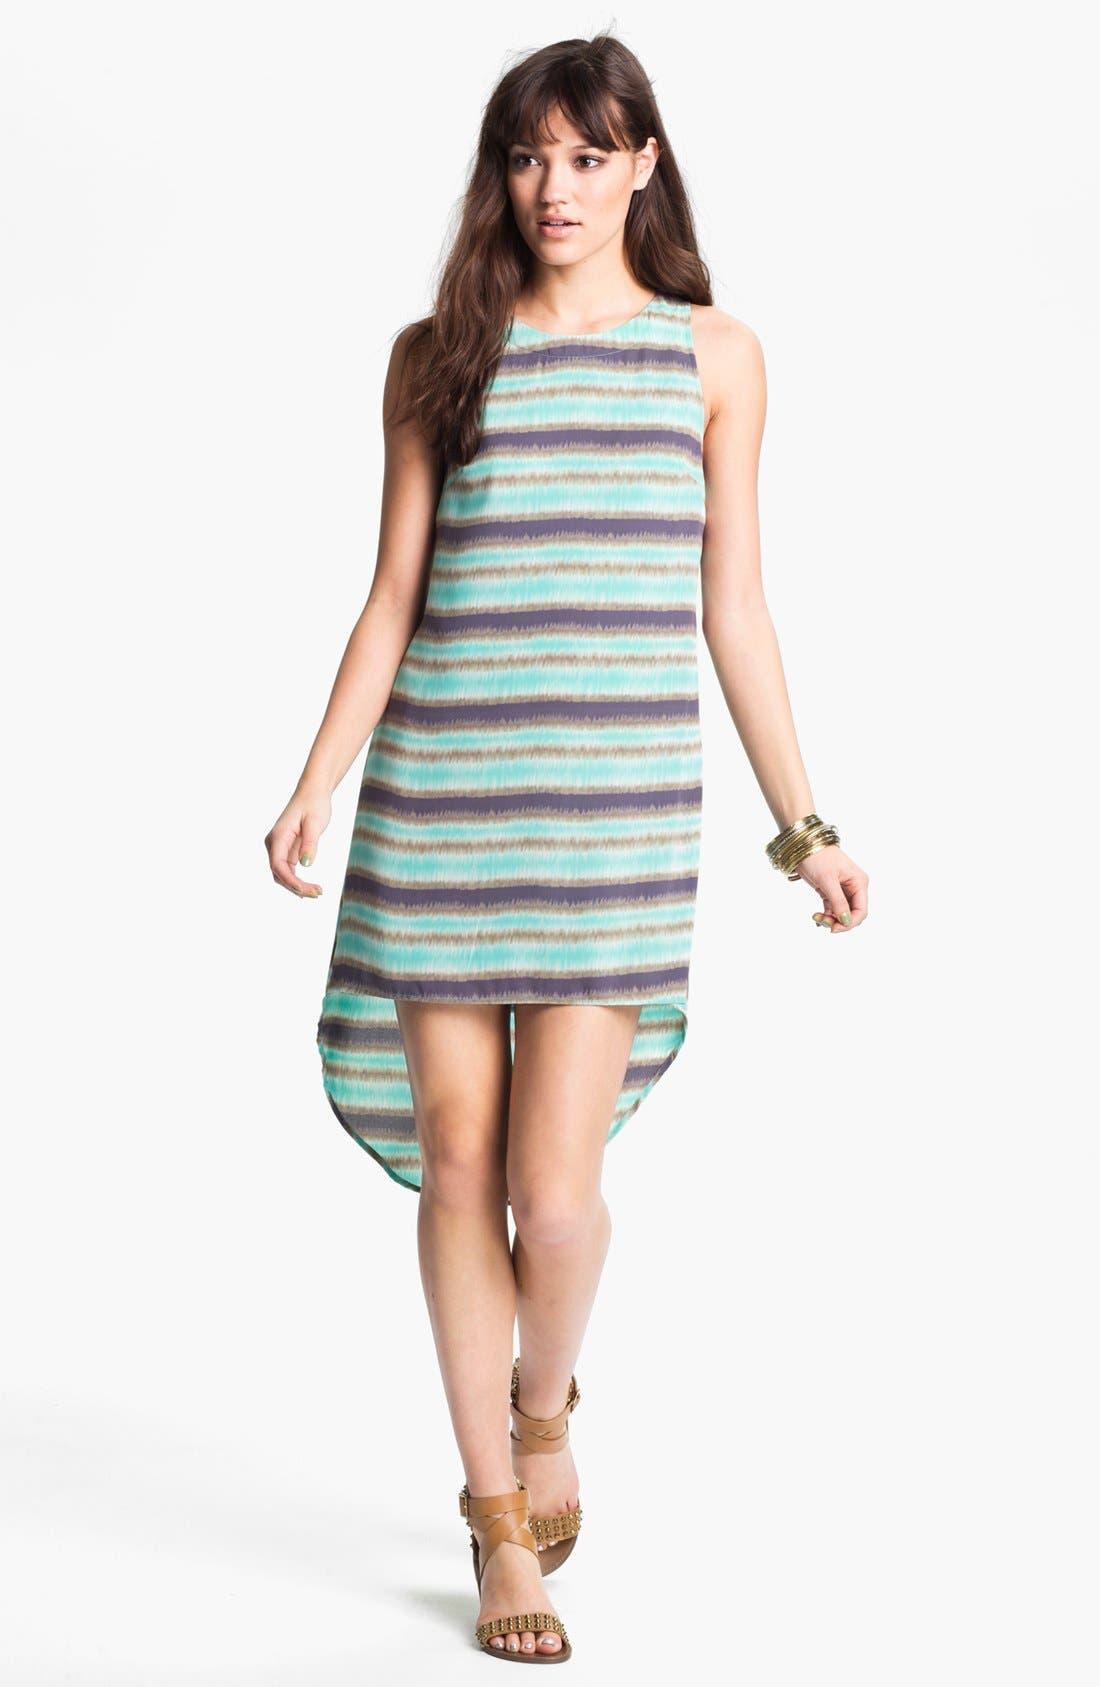 Alternate Image 1 Selected - Lush Print High/Low Shift Dress (Juniors)